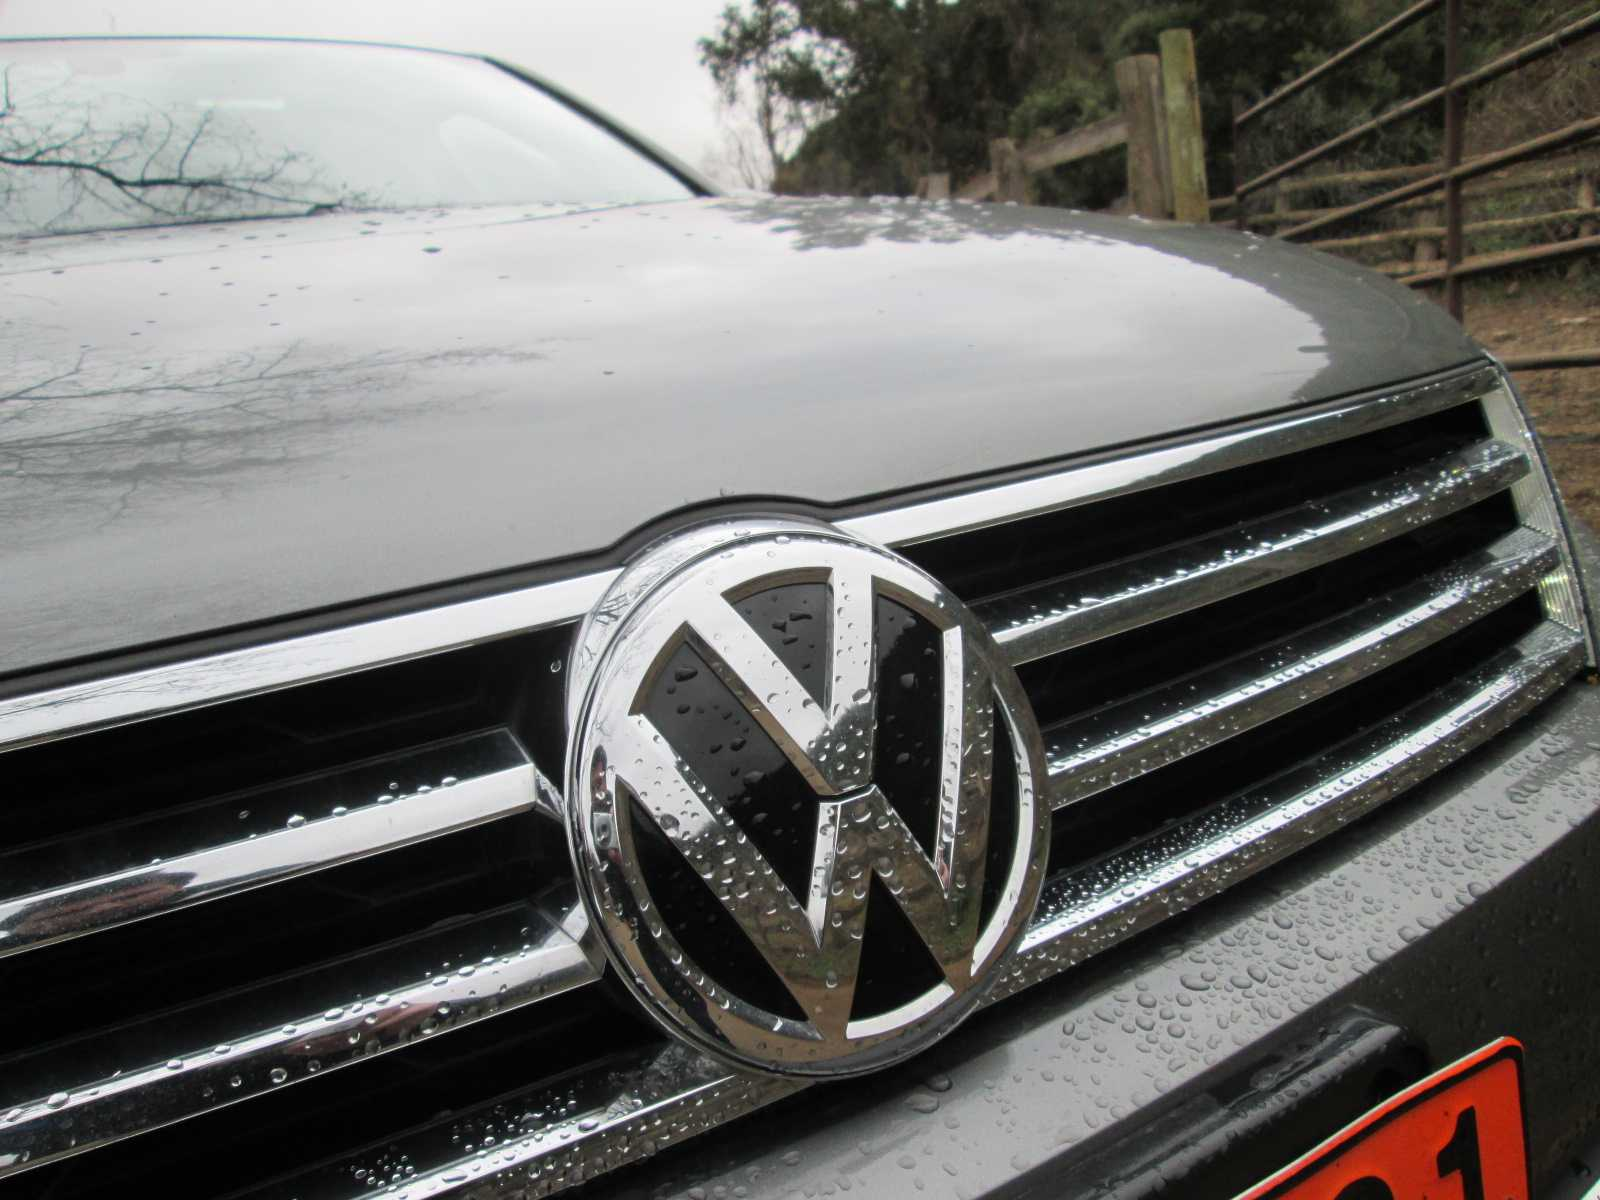 Volkswagen Touareg 3.0 TDI 2016 Test Drive Rutamotor (26)